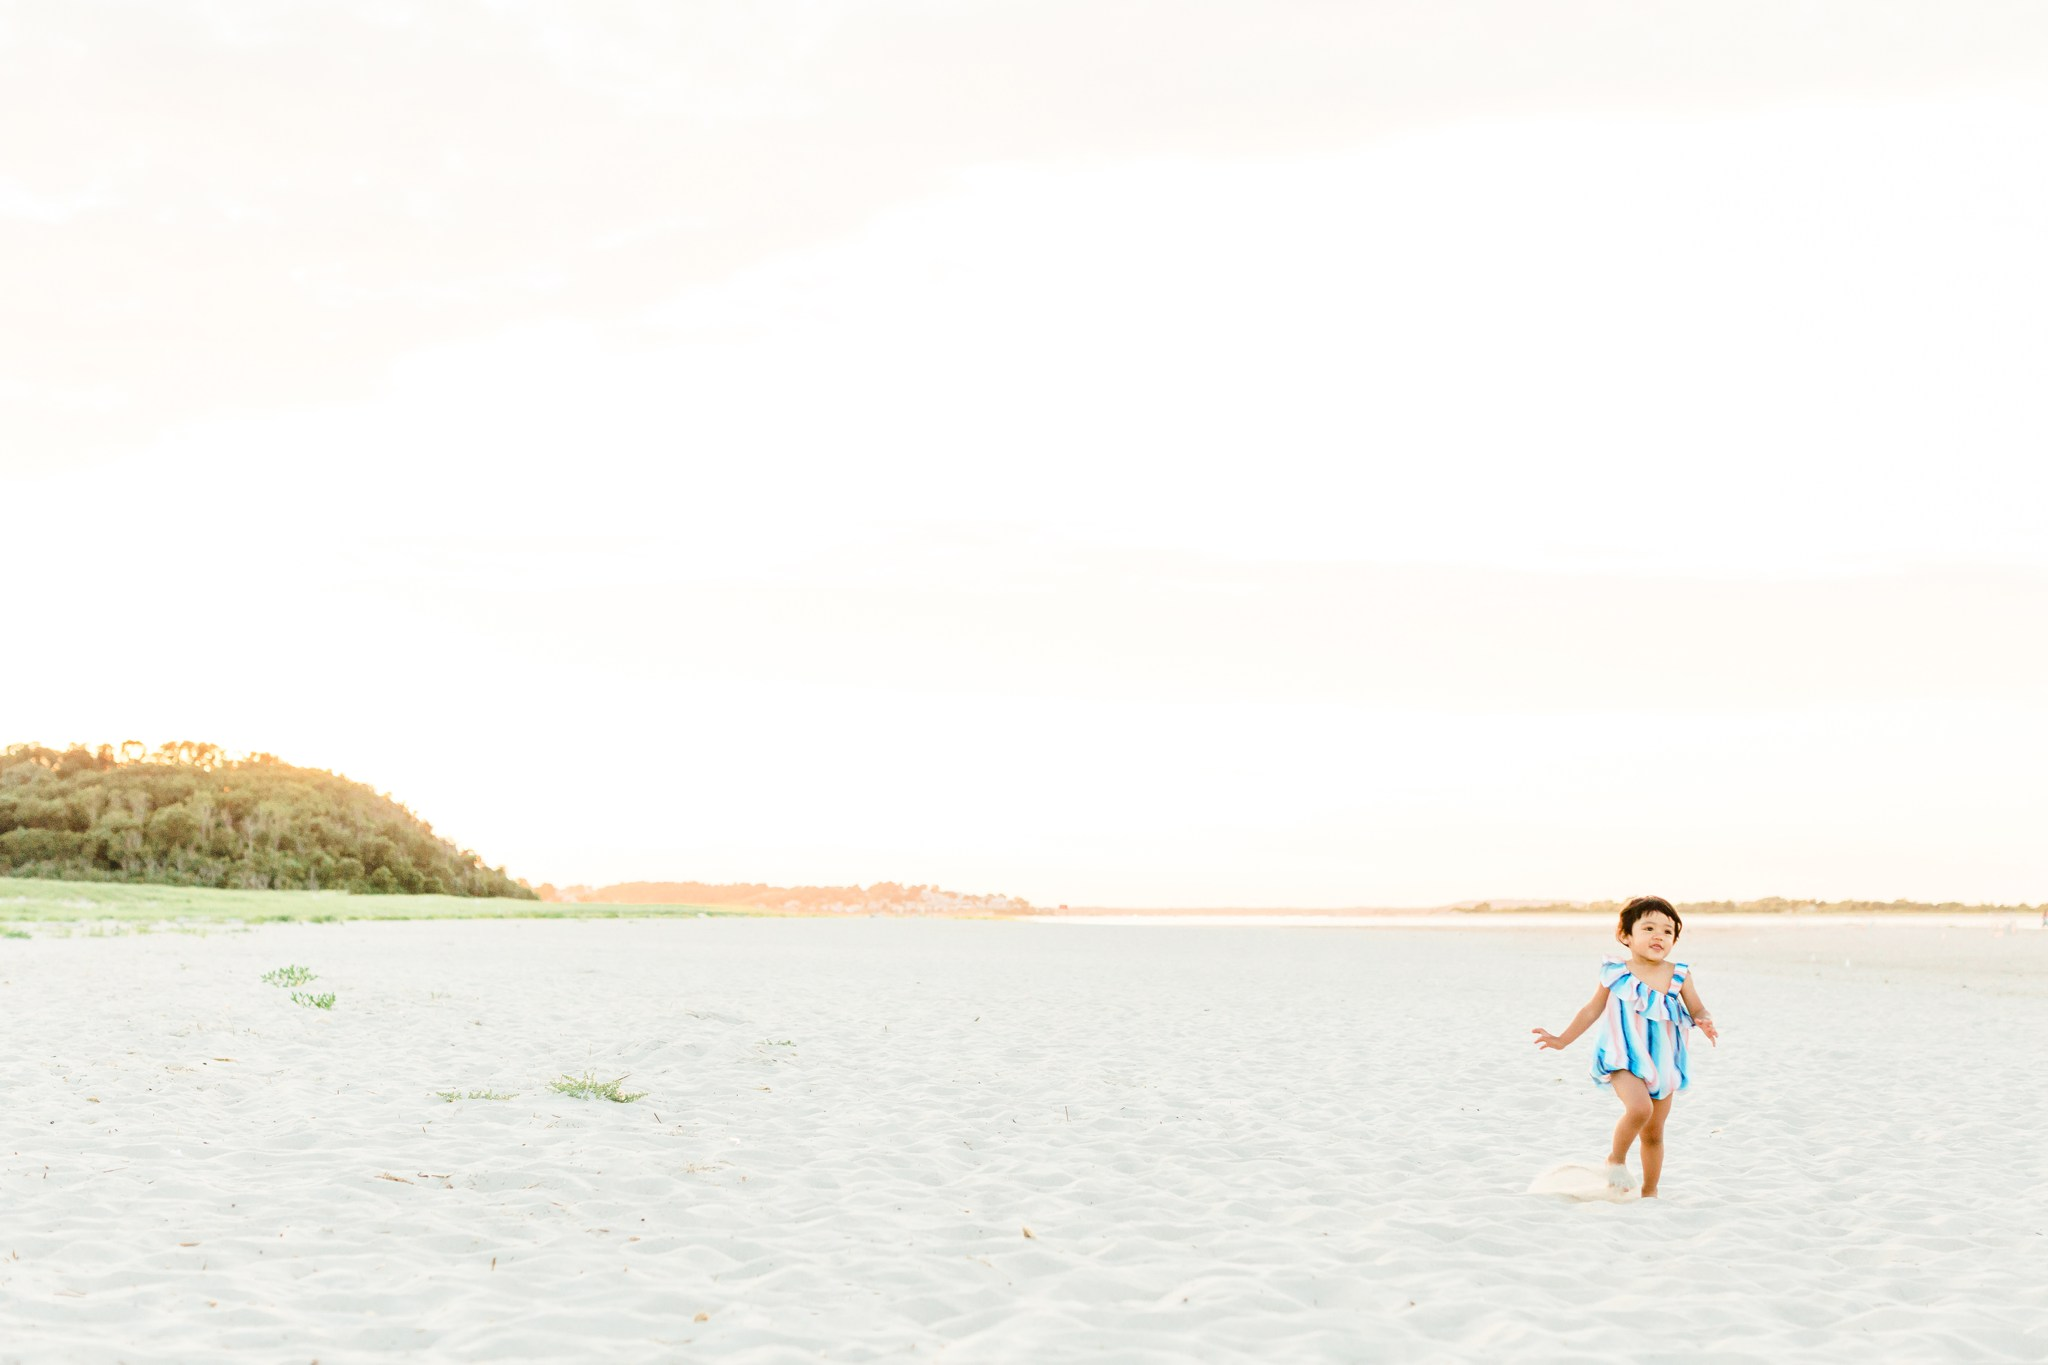 crane_beach_family_portraits_deborah_zoe_00003.JPG